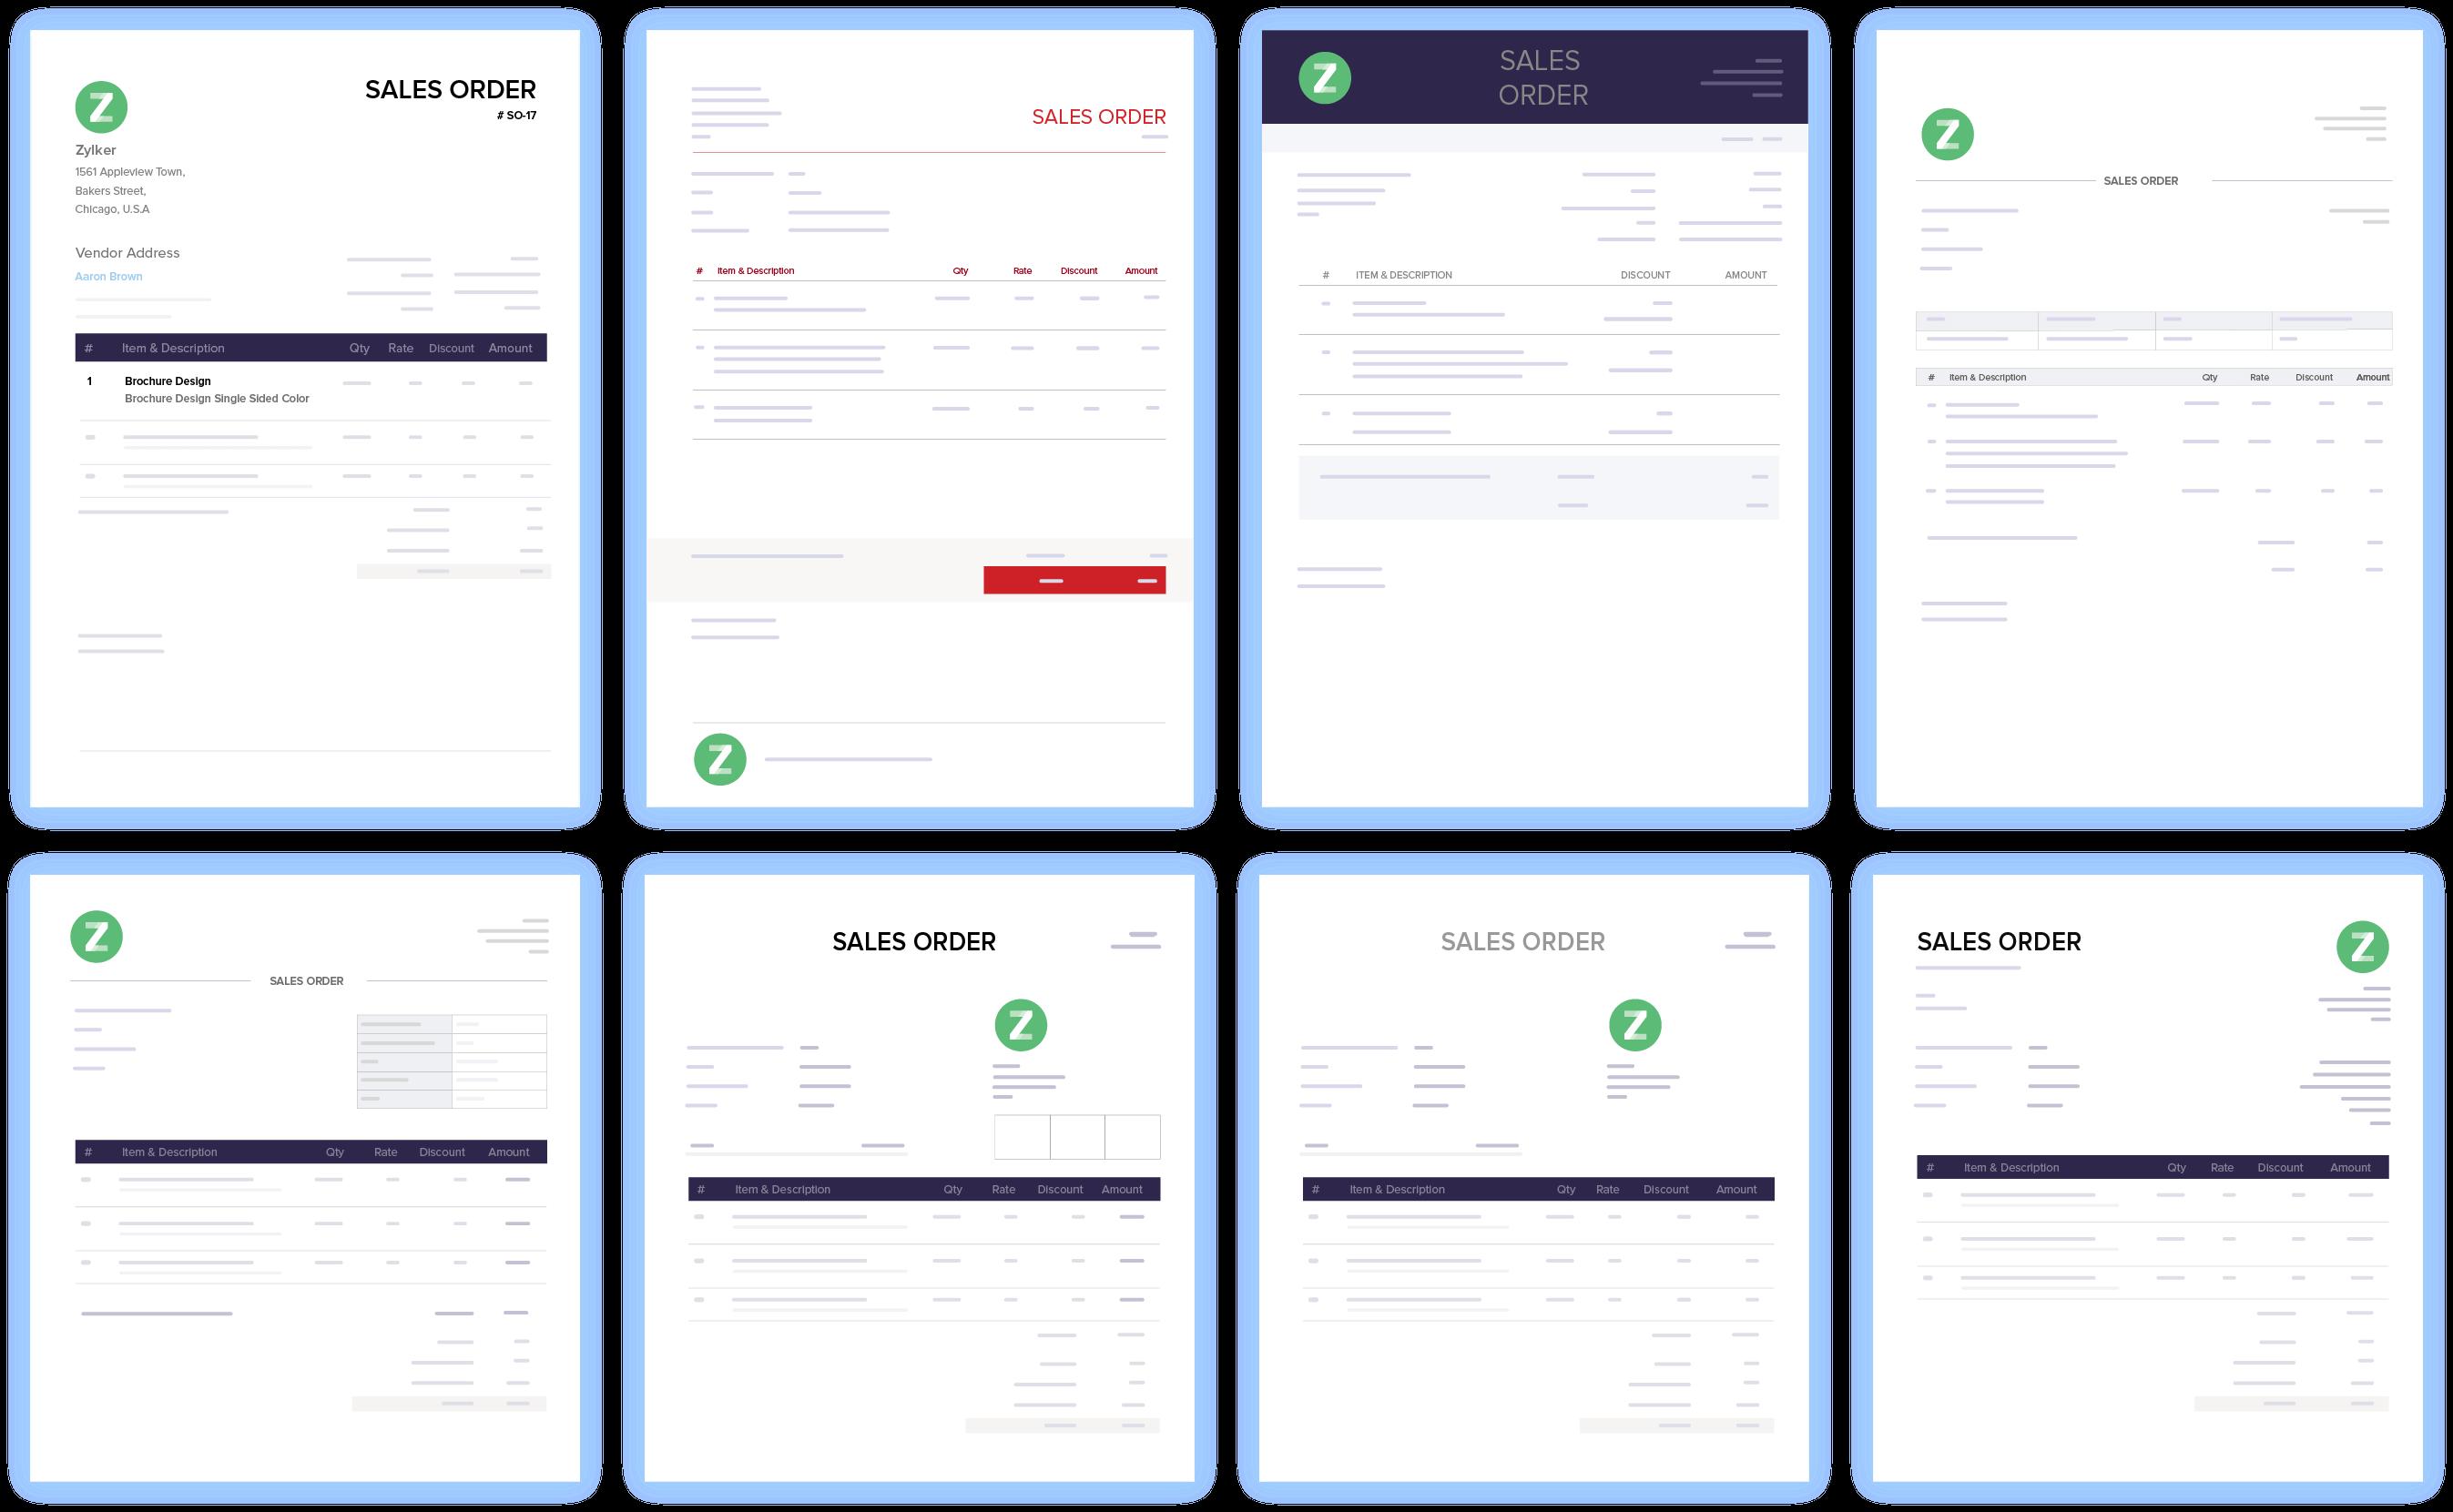 Sales Order Customization - Online Sales Order System | Zoho Books